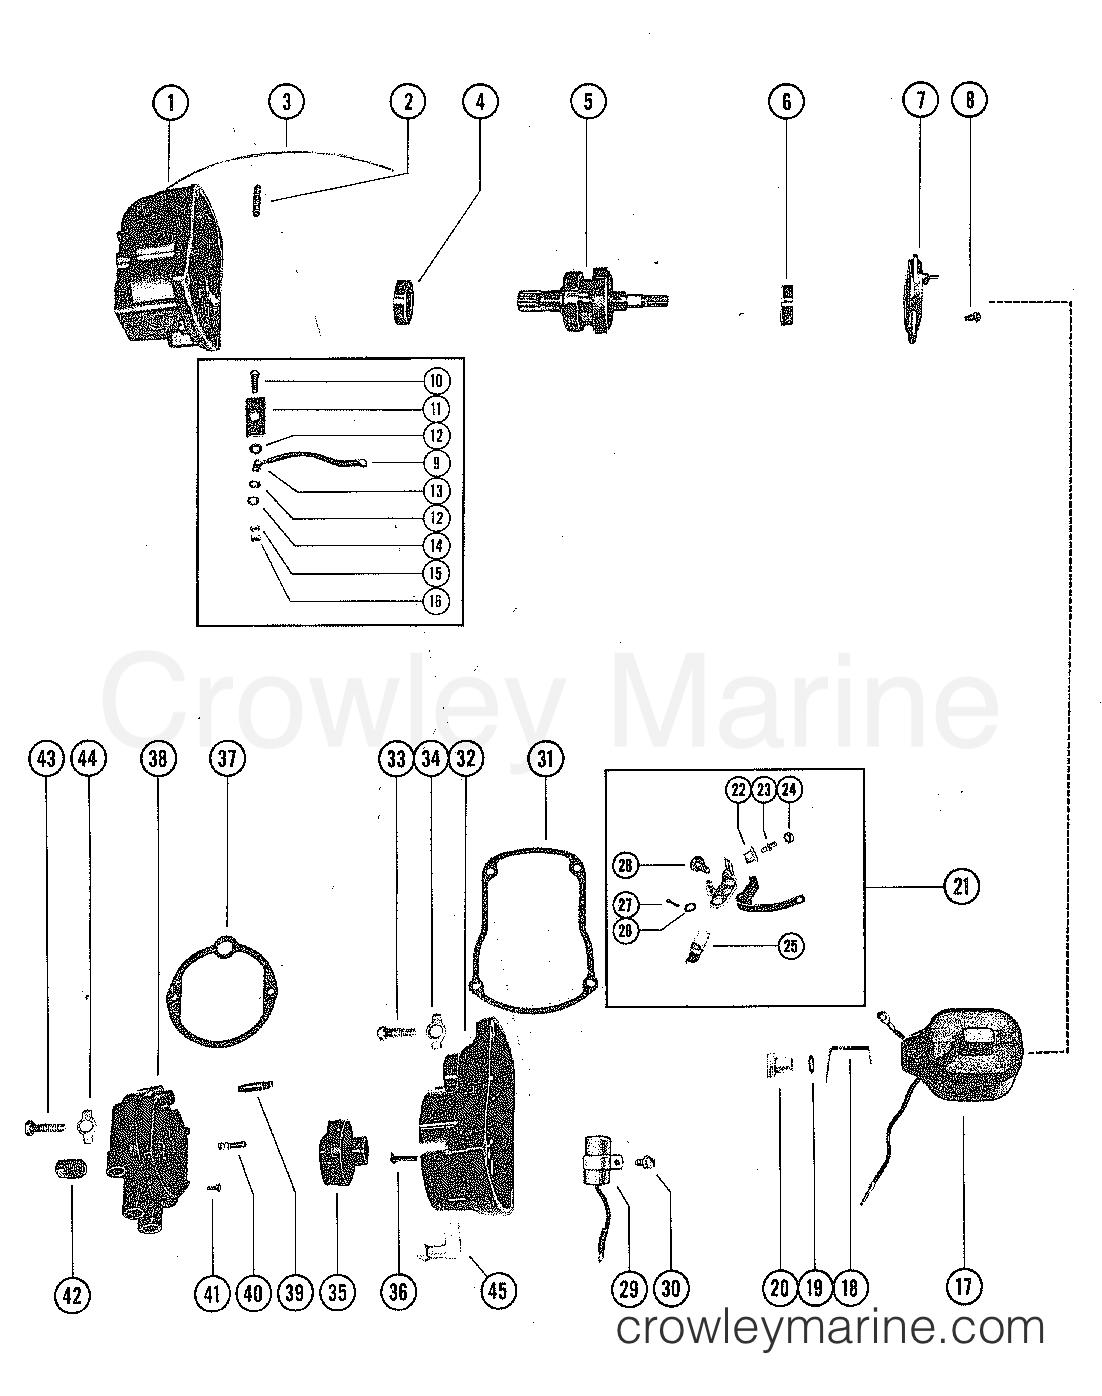 1960 Kiekhaefer Mercury Outboard Wiring Diagram Schematic Diagrams 1992 Llv Keikaufer Control Box Explained Milan